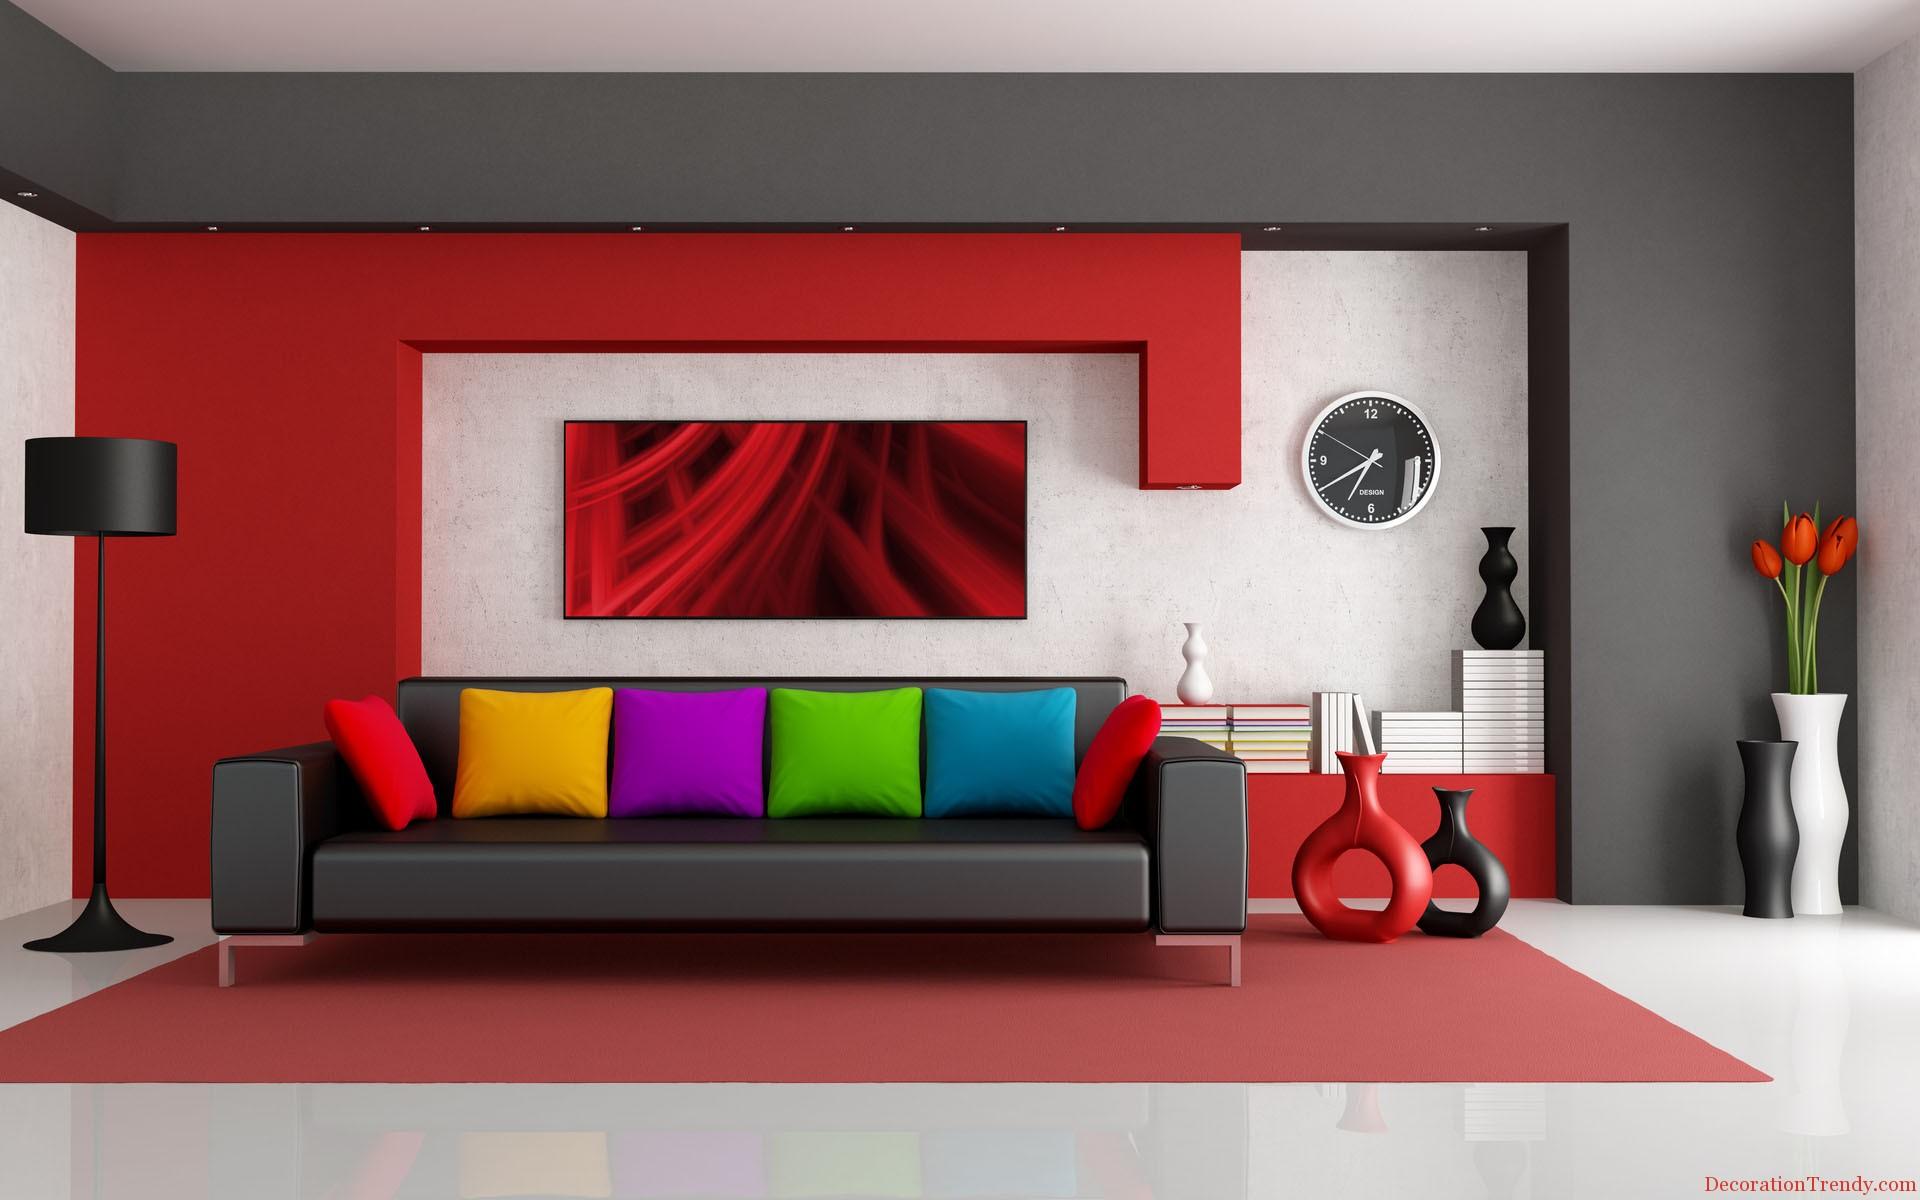 Living Room Decor (Image 7 of 10)